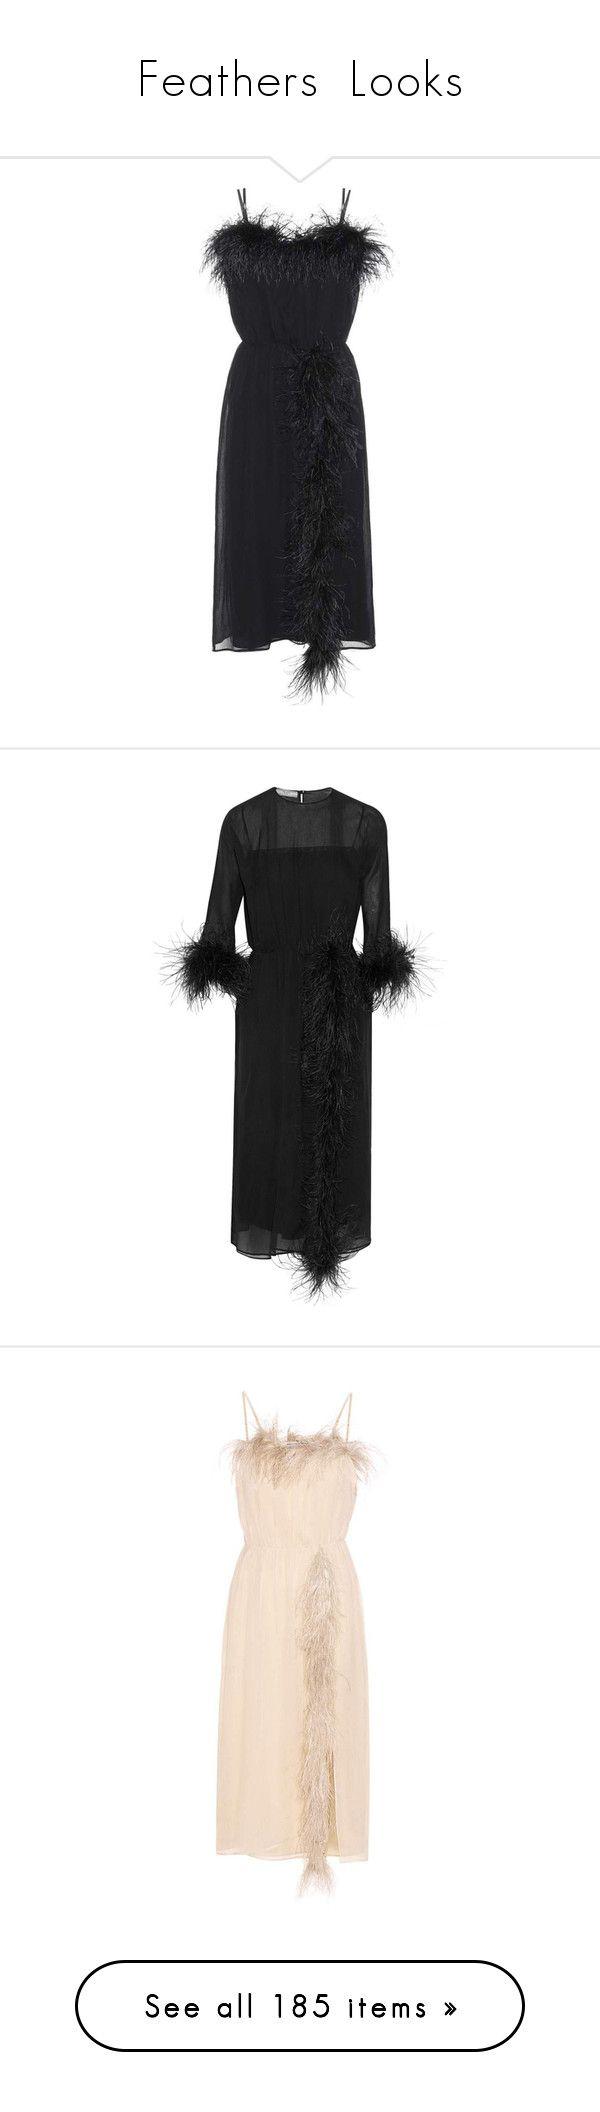 """Feathers  Looks"" by jckyleeah ❤ liked on Polyvore featuring feathers, jckyleeahfeatherscollection, dresses, prada, black, silk cocktail dress, silk dress, prada dresses, feather trim dress and keyhole midi dress"